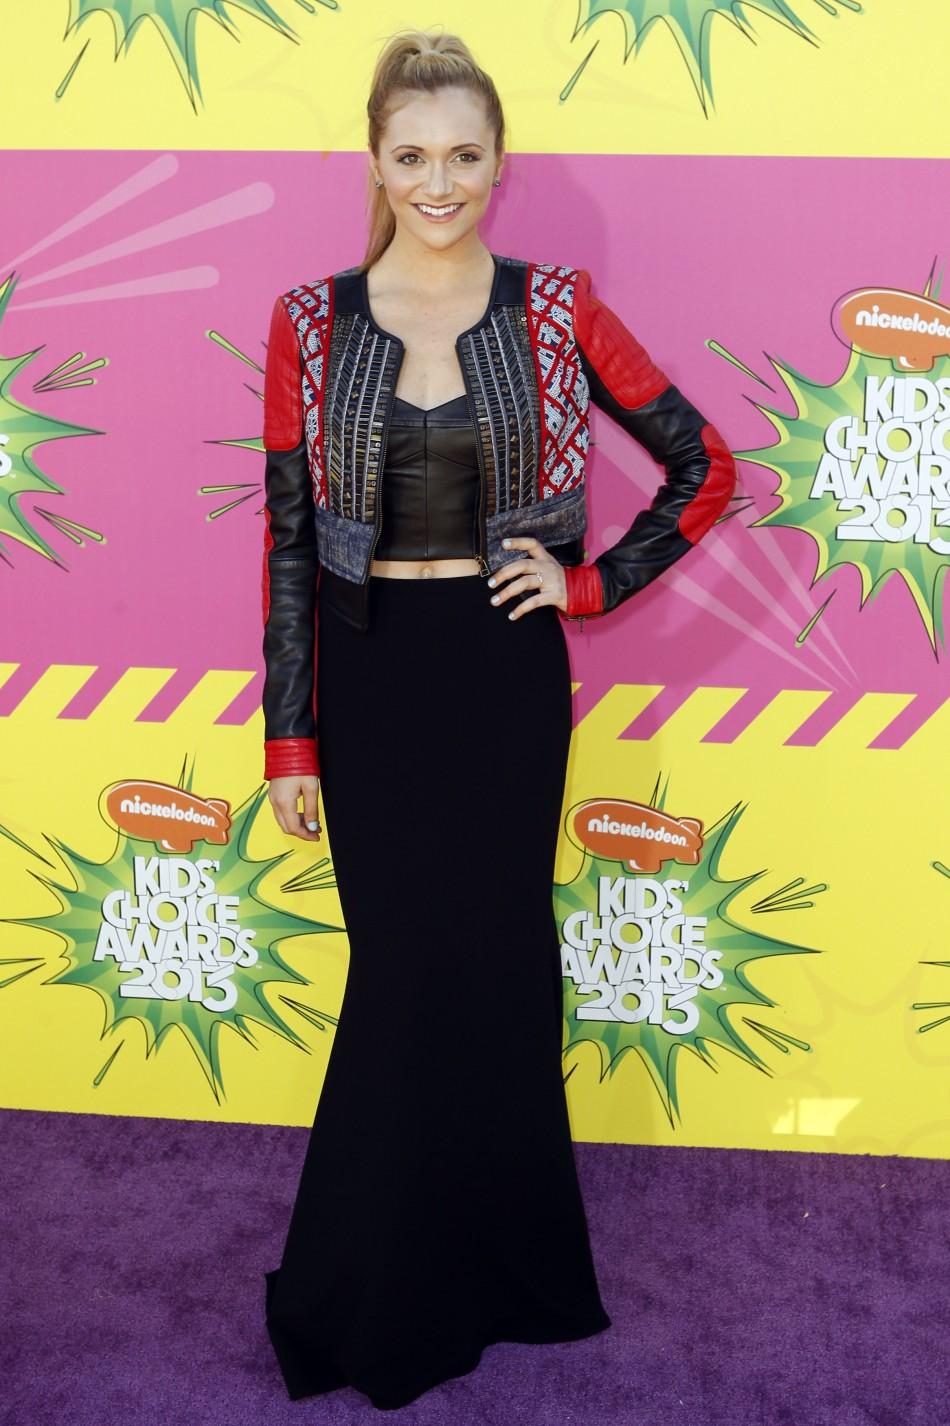 Actress Alyson Stoner arrives at the 2013 Kids Choice Awards